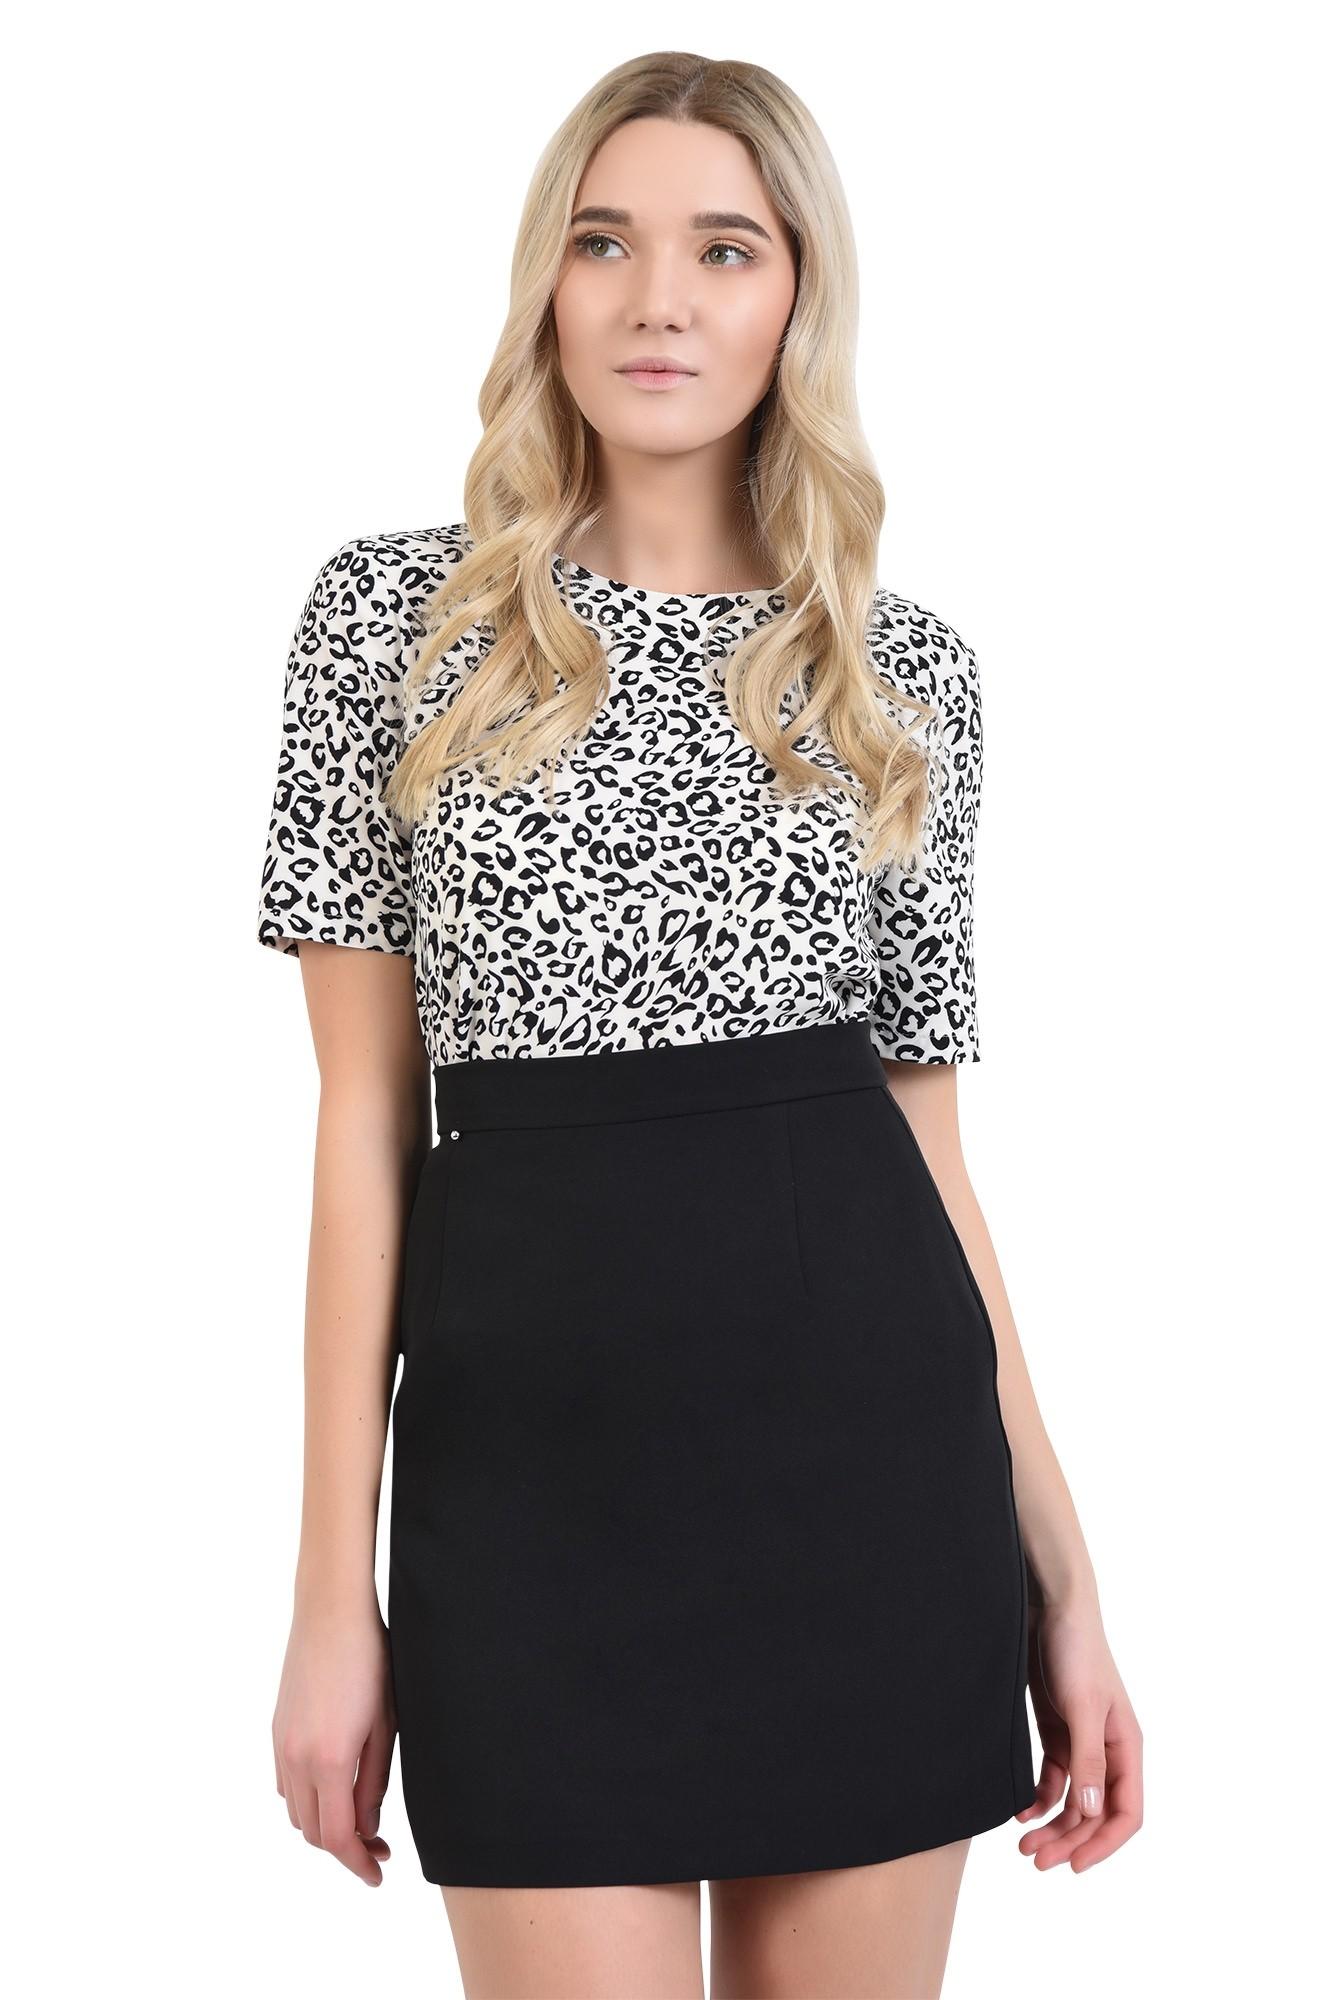 bluze online, bluza de zi, imprimeu leopard, alb-negru, decolteu rotund la baza gatului